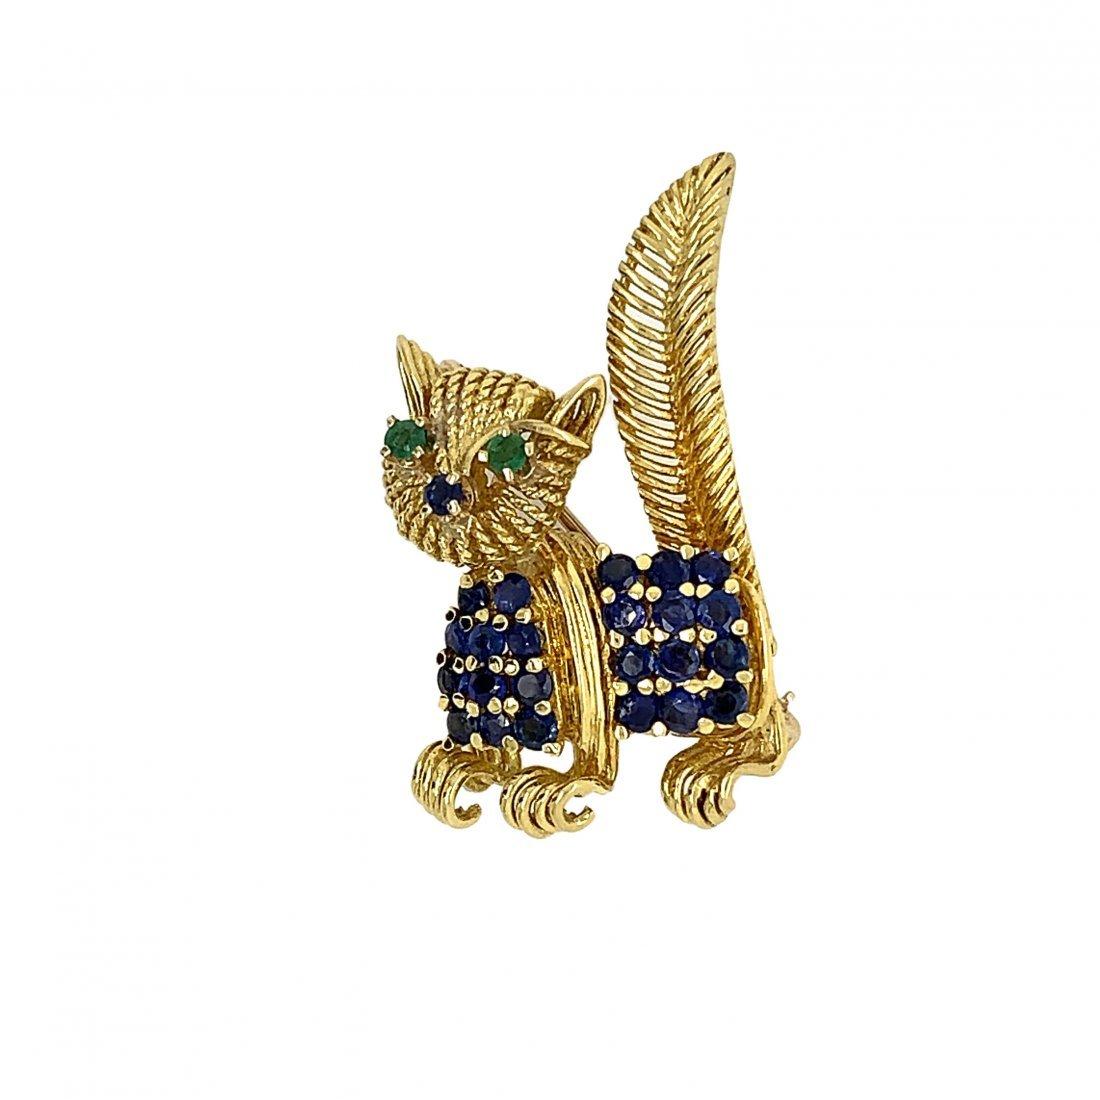 Tiffany & Co 18k Yellow Gold Cat Brooch